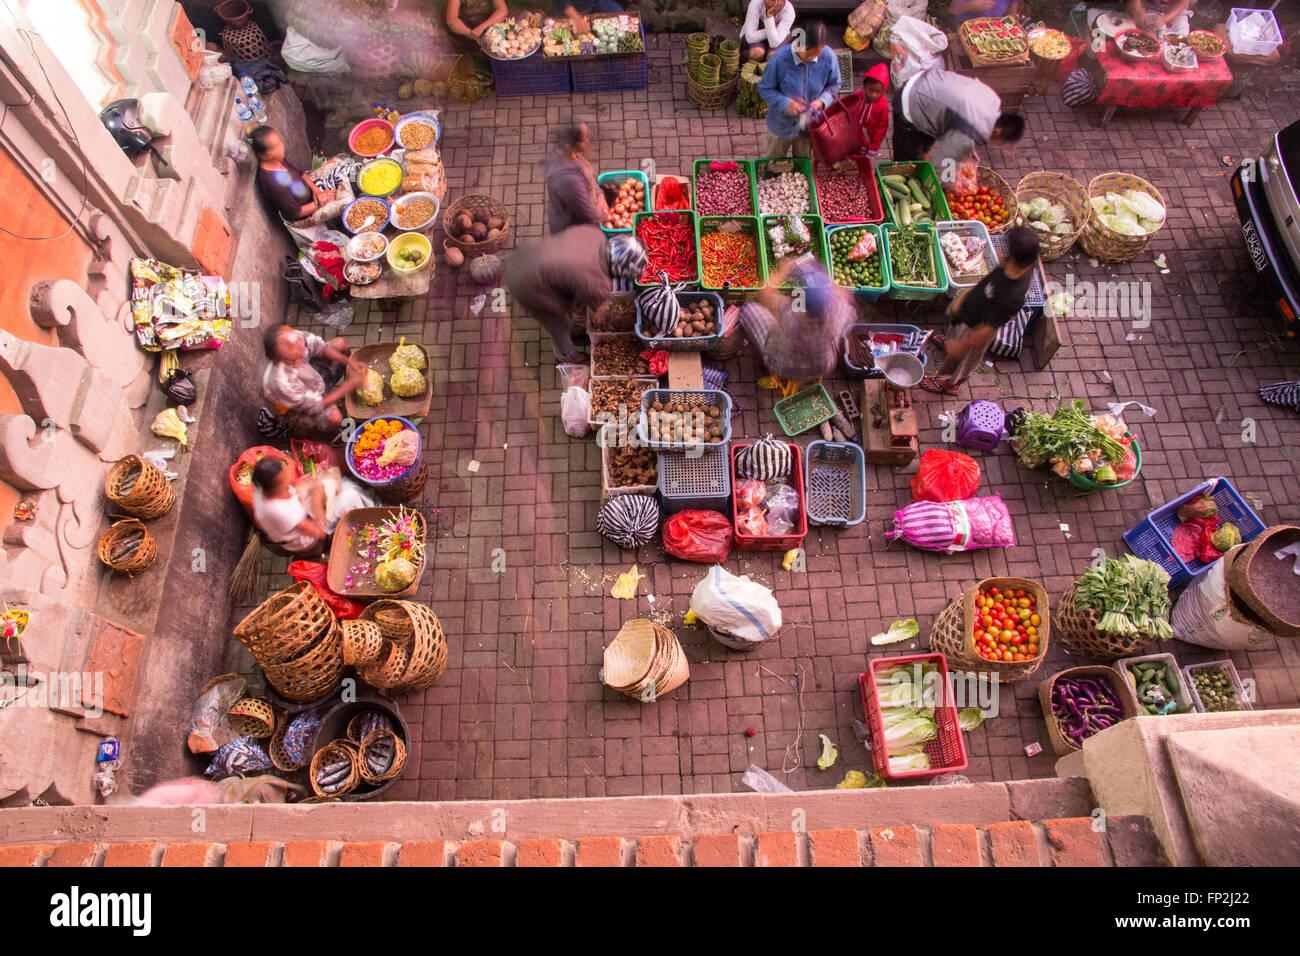 Asia, Indonesia, Bali. Ubud early morning market with flowers,fruit and vegetable market, Bali. Balinese people - Stock Image